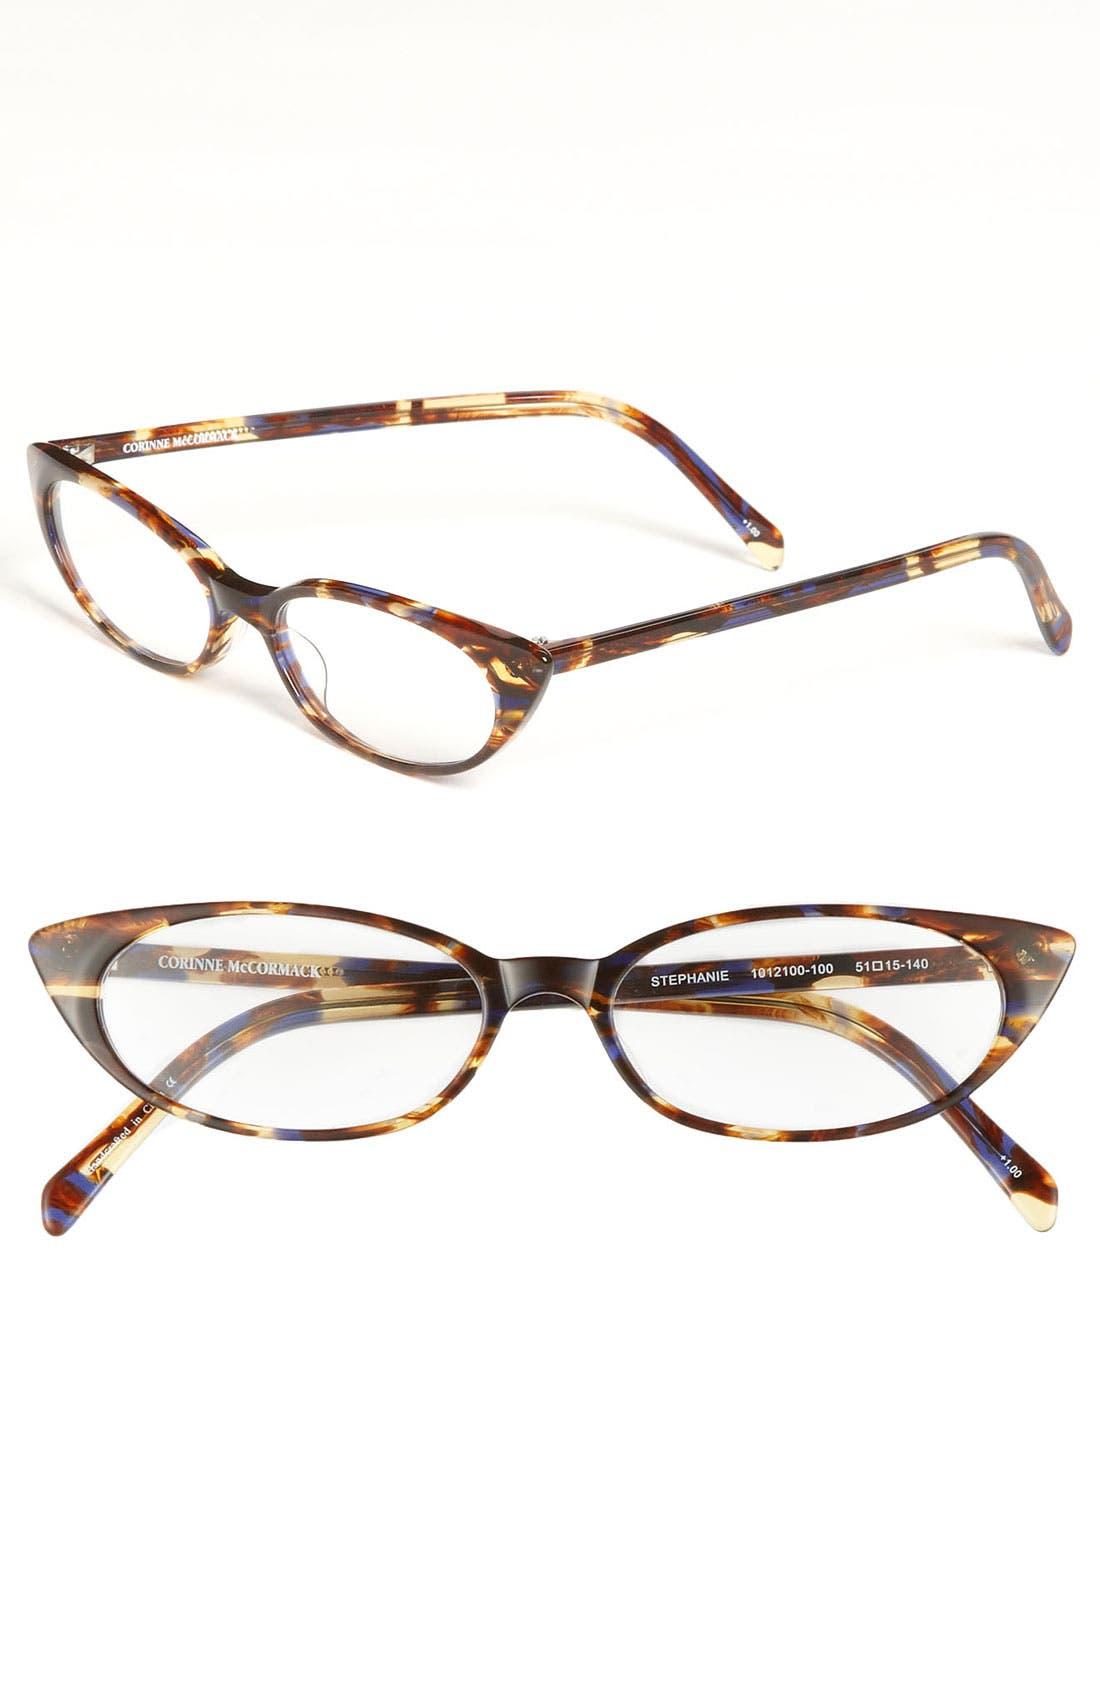 Main Image - Corinne McCormack 51mm Reading Glasses